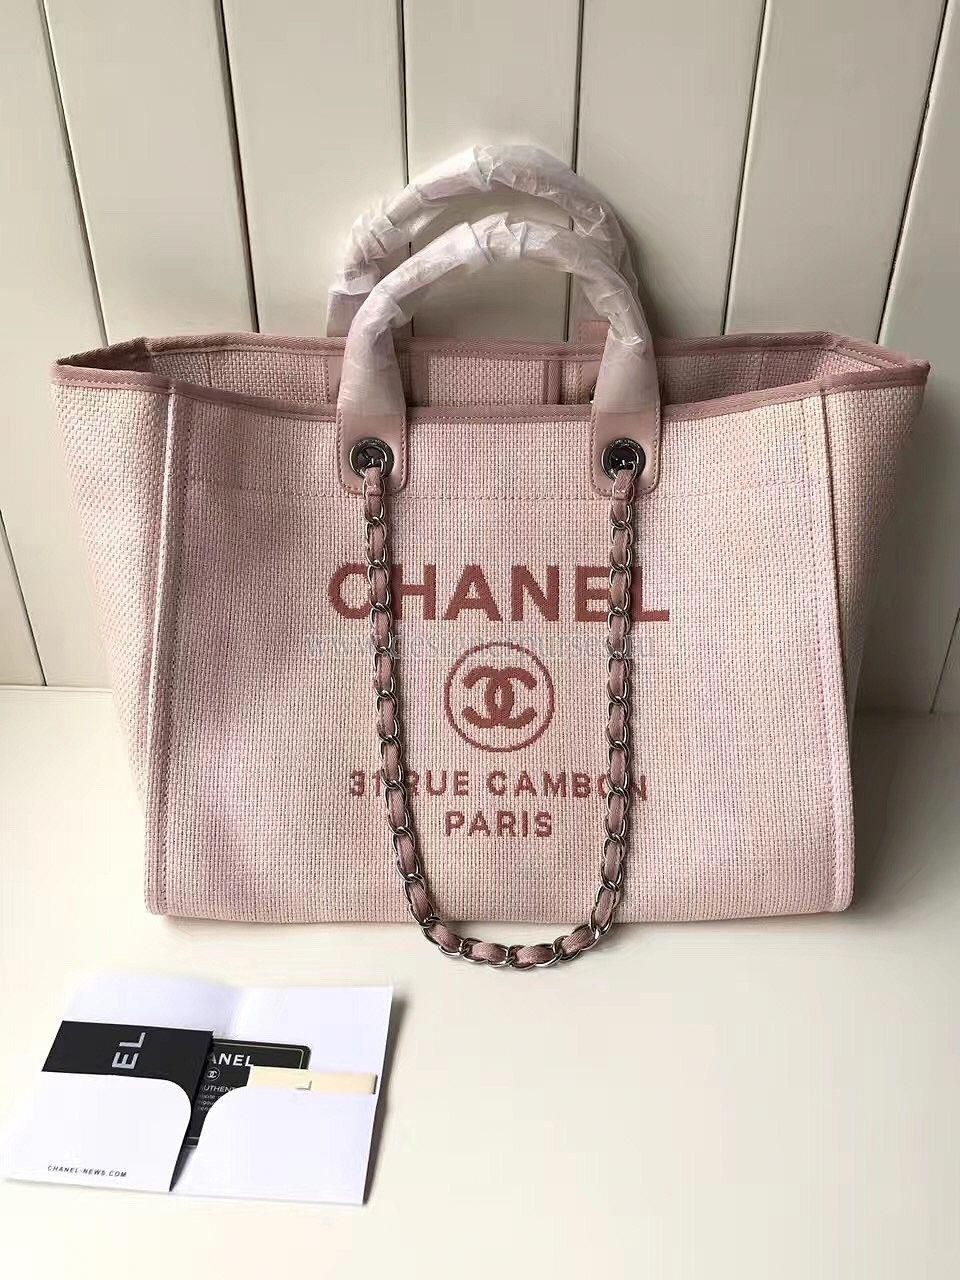 e68a5728ace2 chanel handbags collectionchanel handbags for women authentic   Chanelhandbags